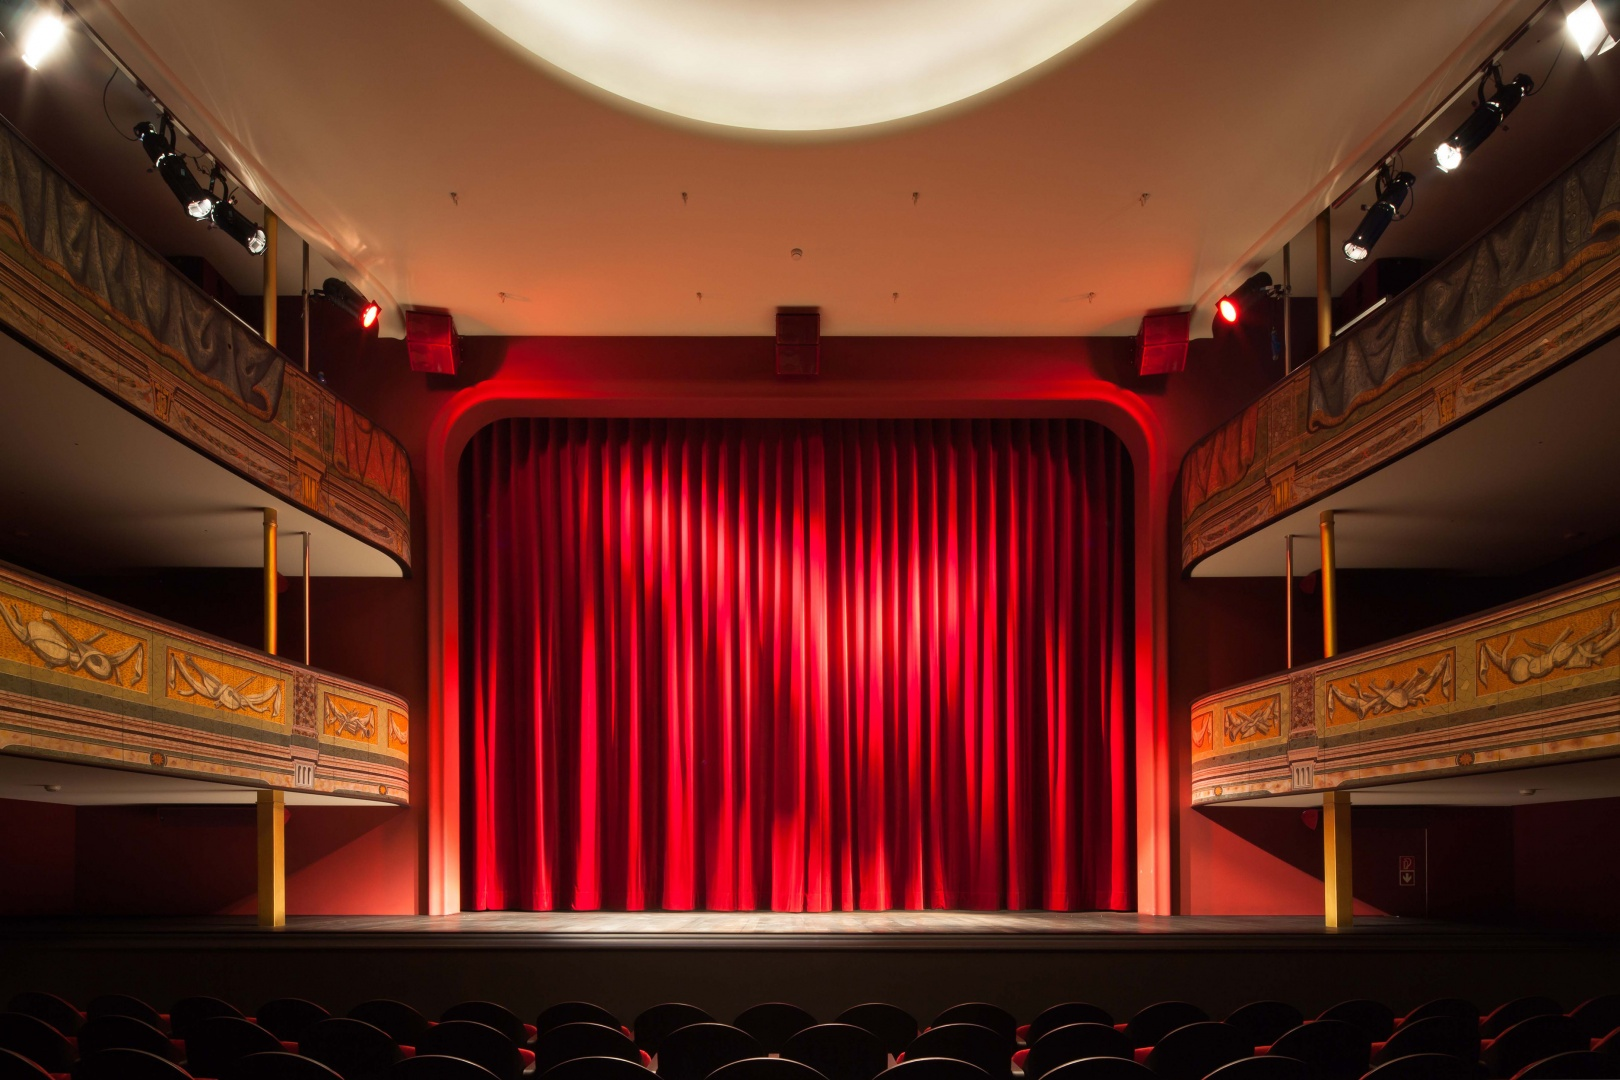 Stadttheater_Bühne.jpg © Johannes Iff, St. Urbangasse 1, 4500 Solothurn